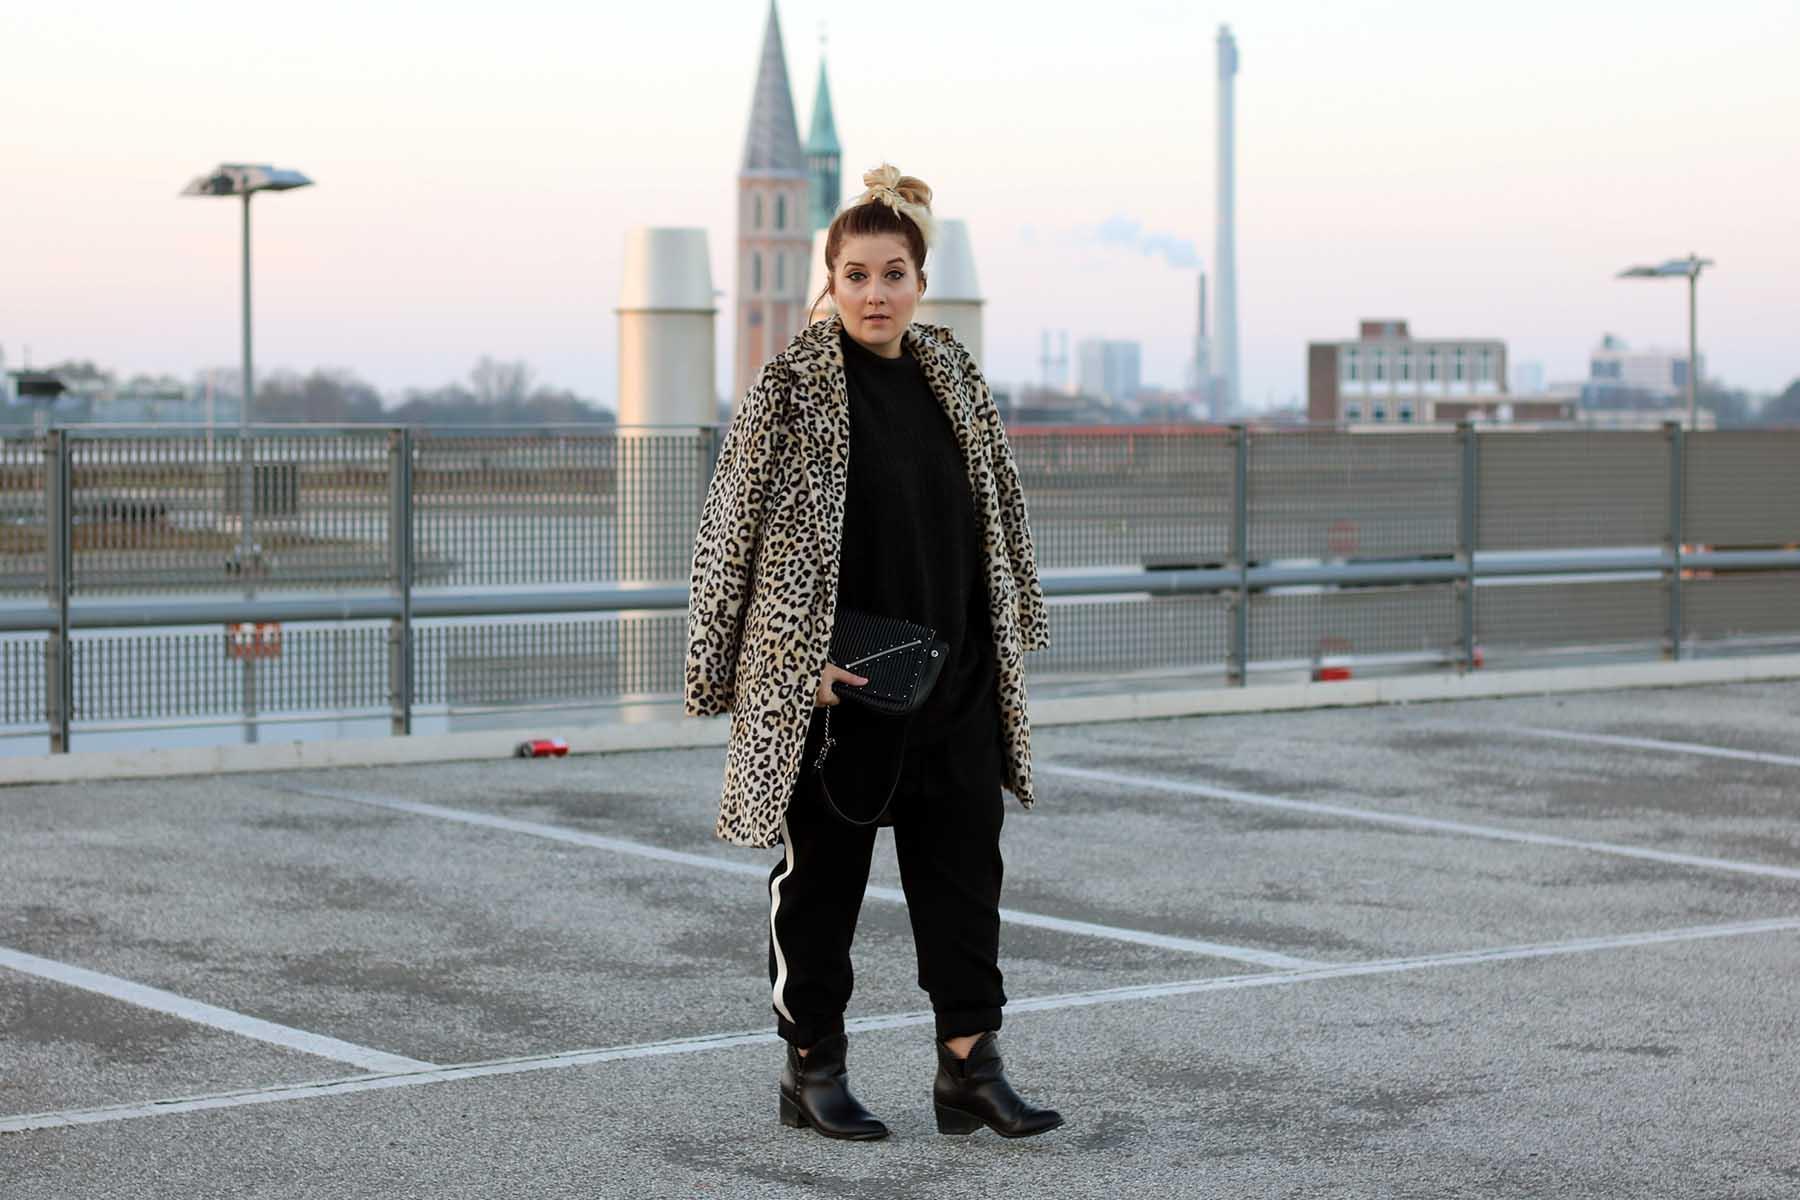 outift-leomantel-mantel-winter-leoparden-modeblog-fashionblog-look-braunschweig4